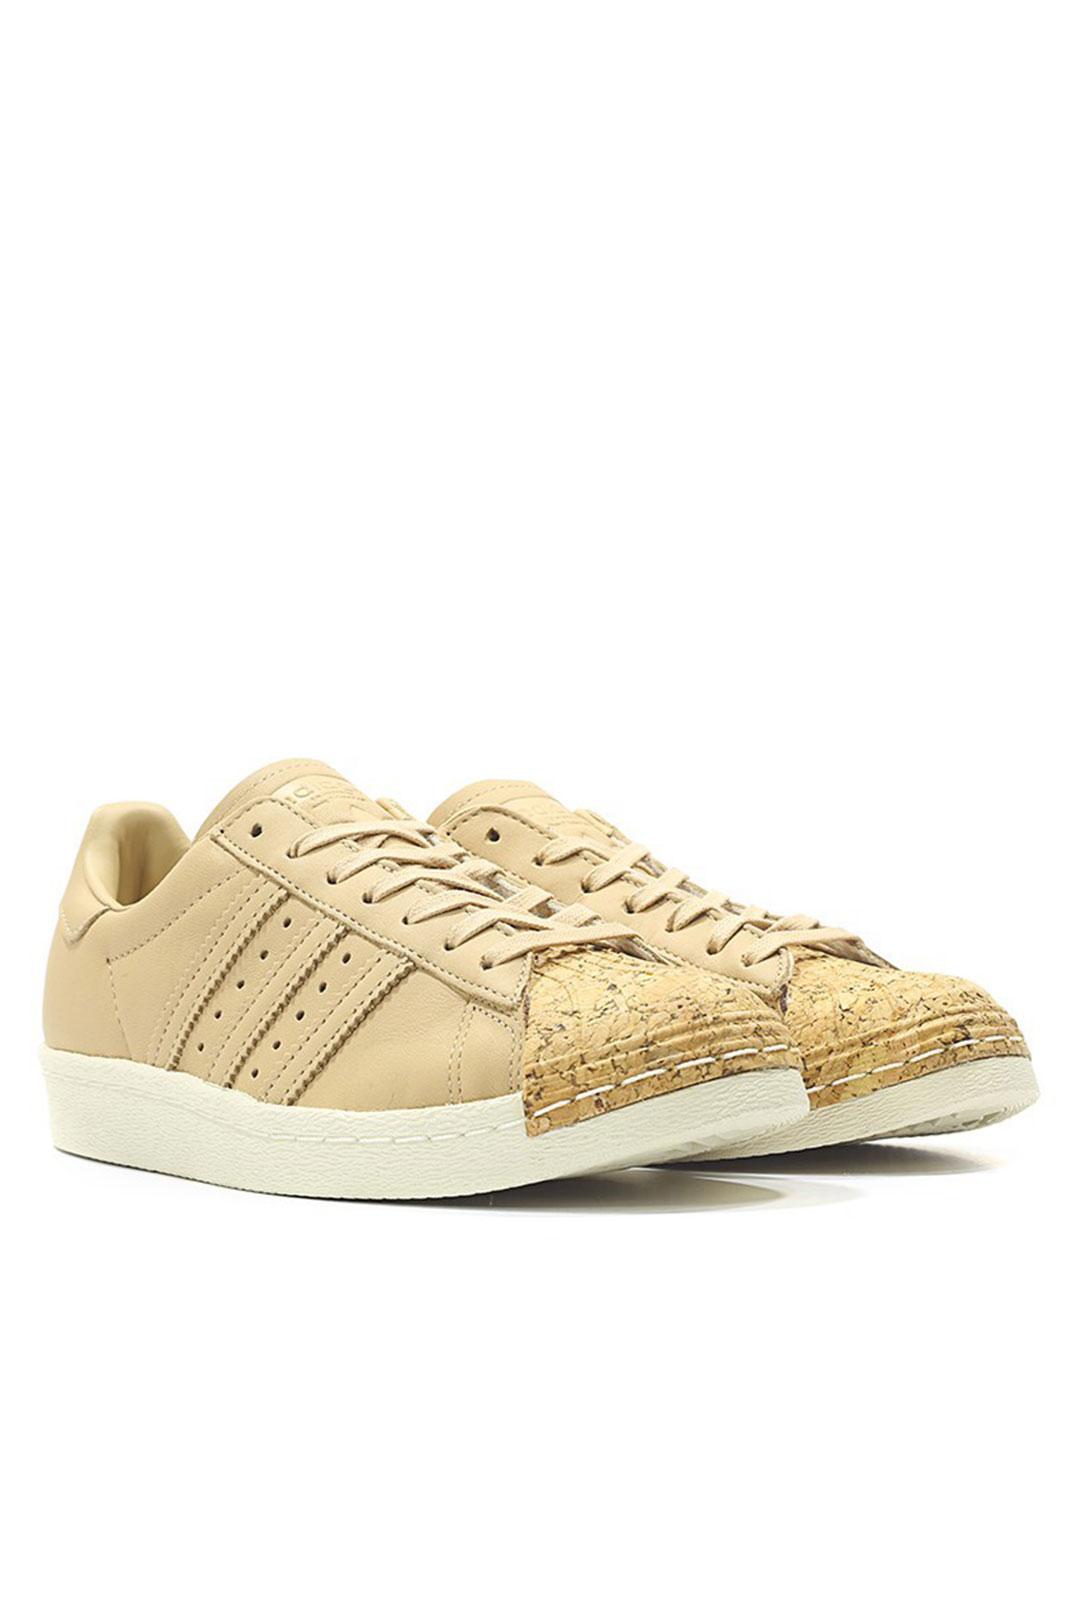 Baskets / Sneakers  Adidas BA7604 SUPERSTAR 80S CORK W BEIGE